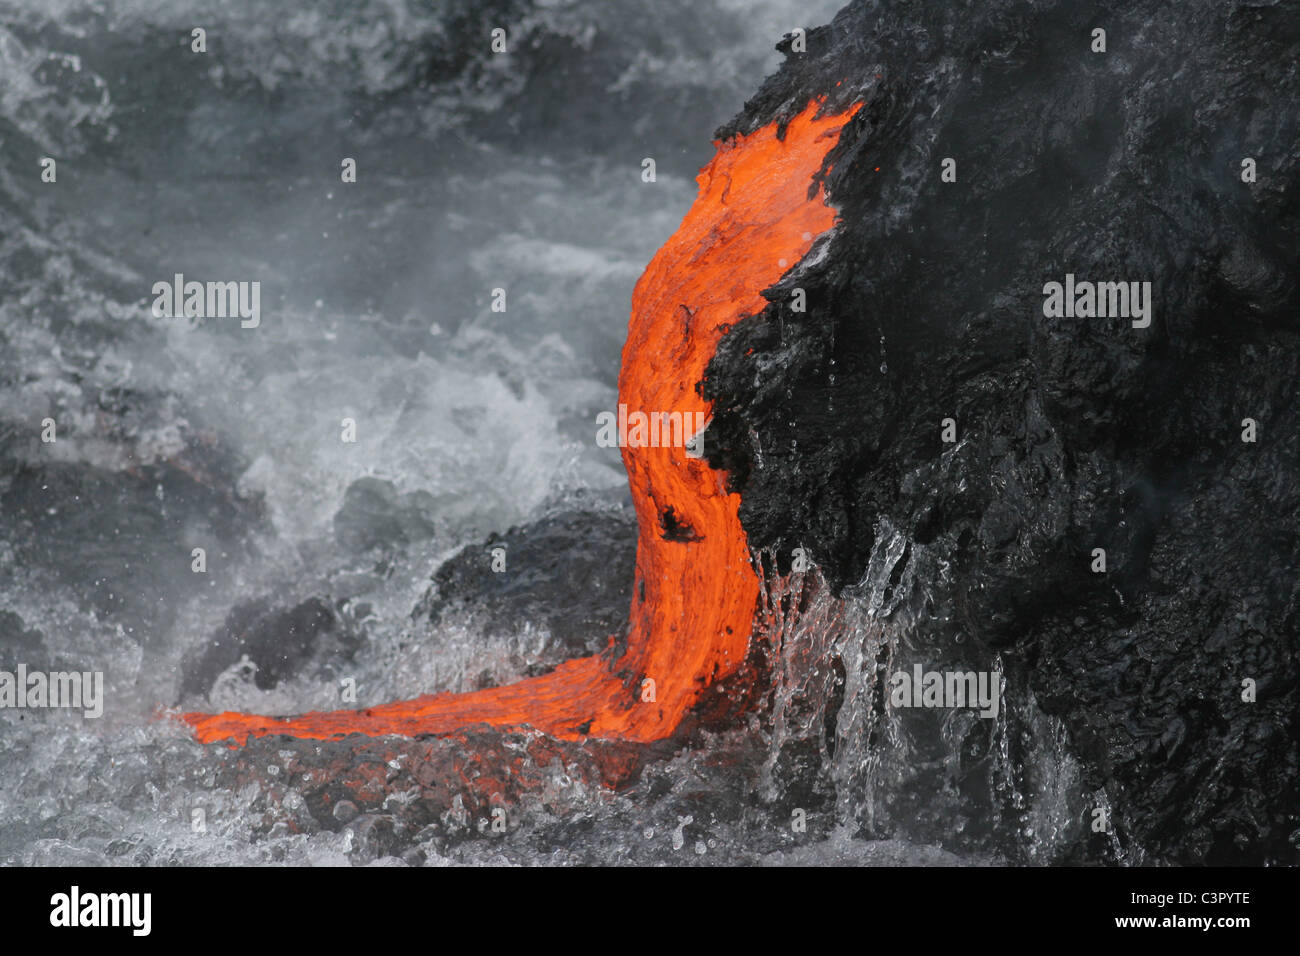 USA, Hawaii, Big Island, Lava entering sea - Stock Image